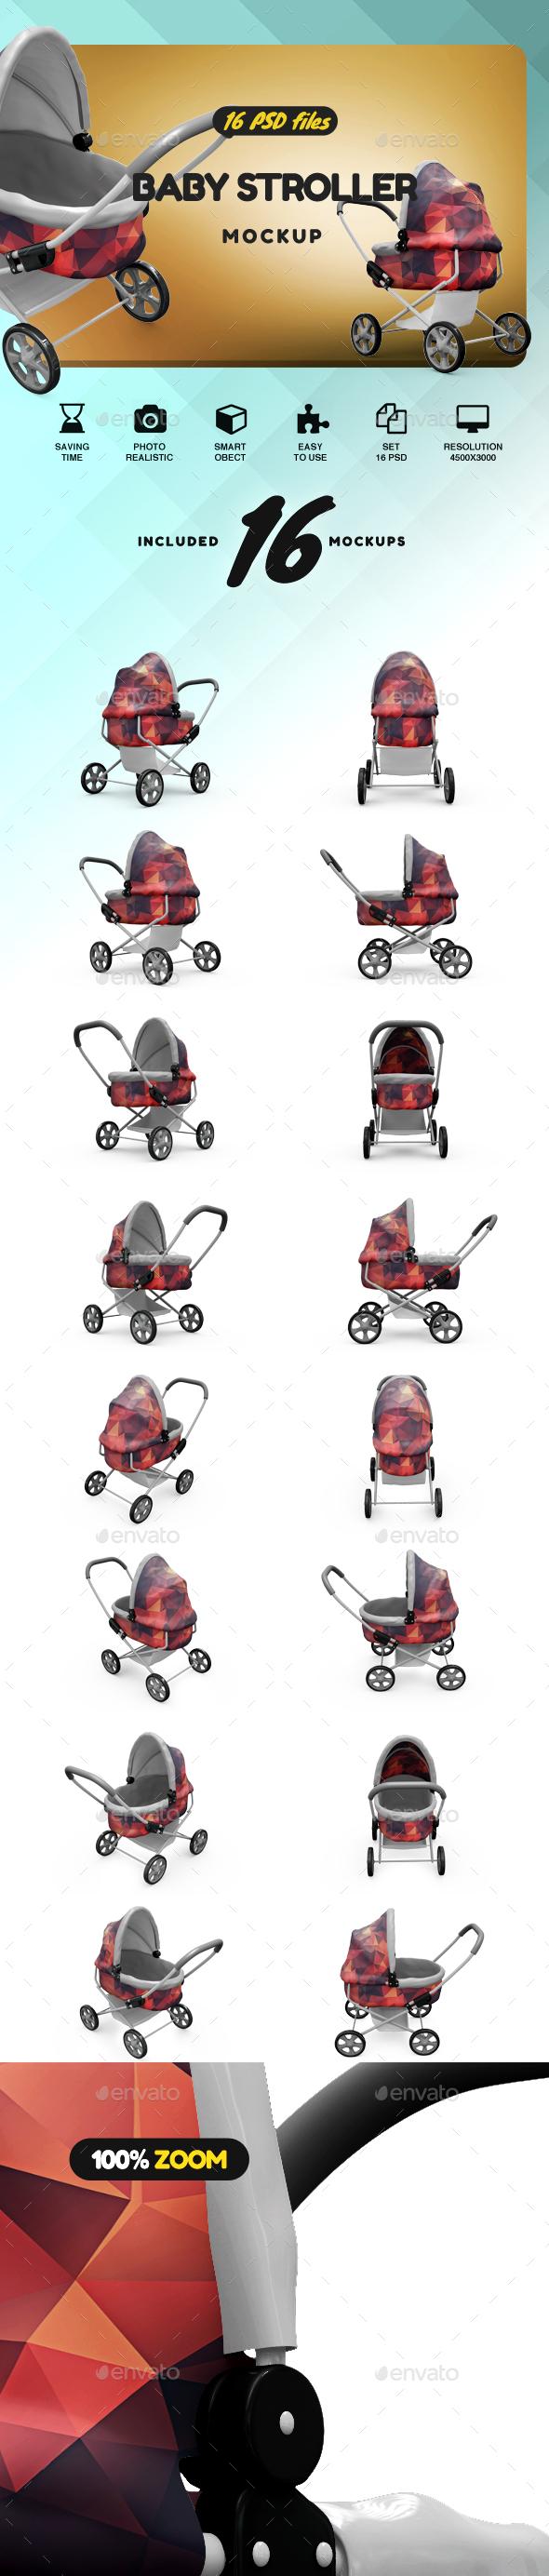 GraphicRiver Baby Stroller MockUp 21158170